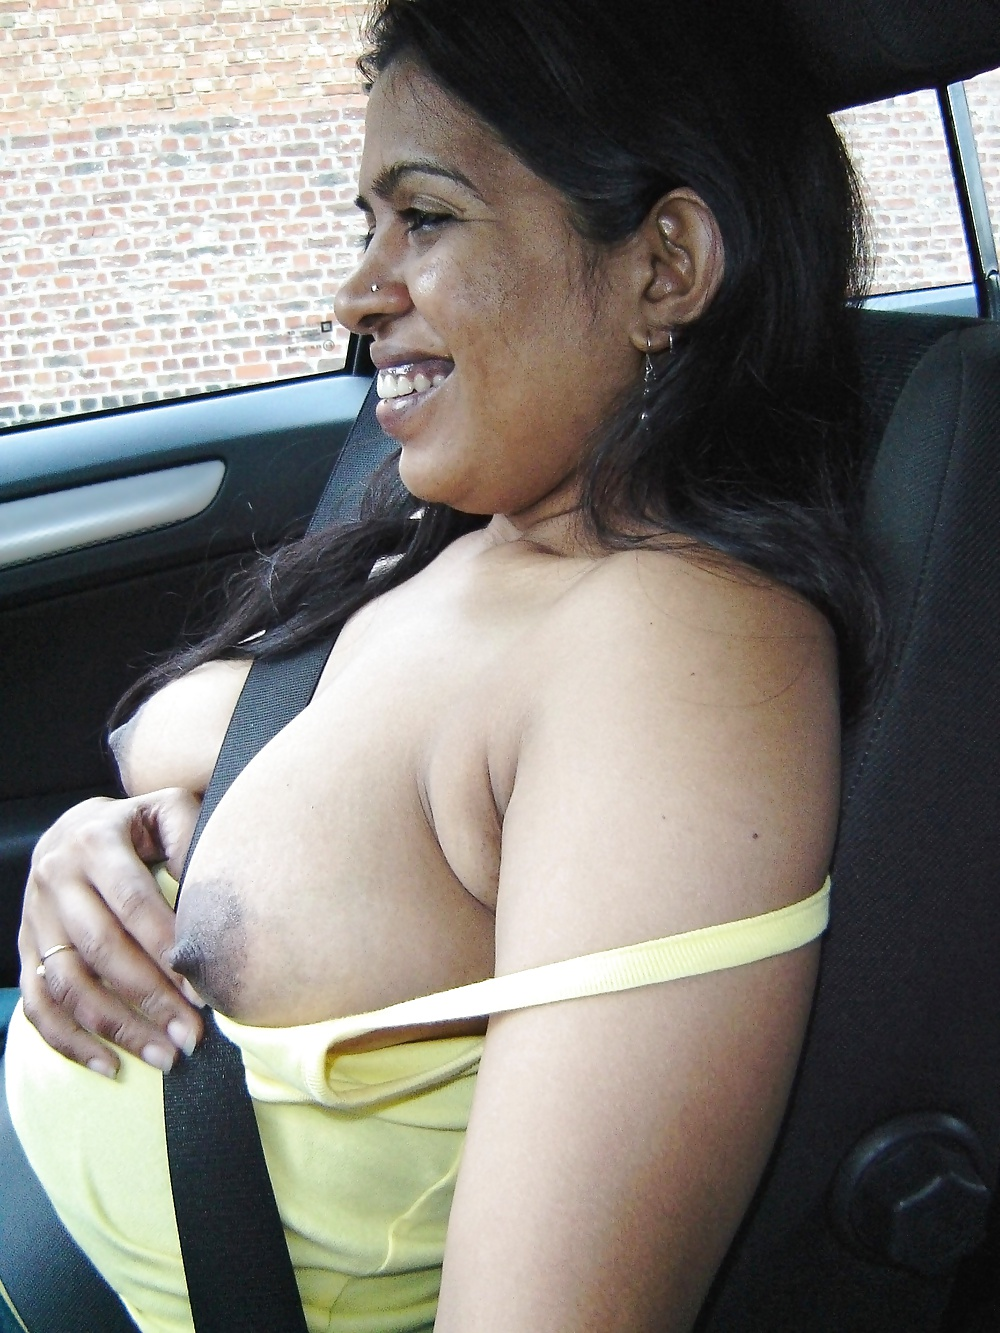 Desi Indian Milf Loves Exposing Herself Outdoors 2 - 8 -5978